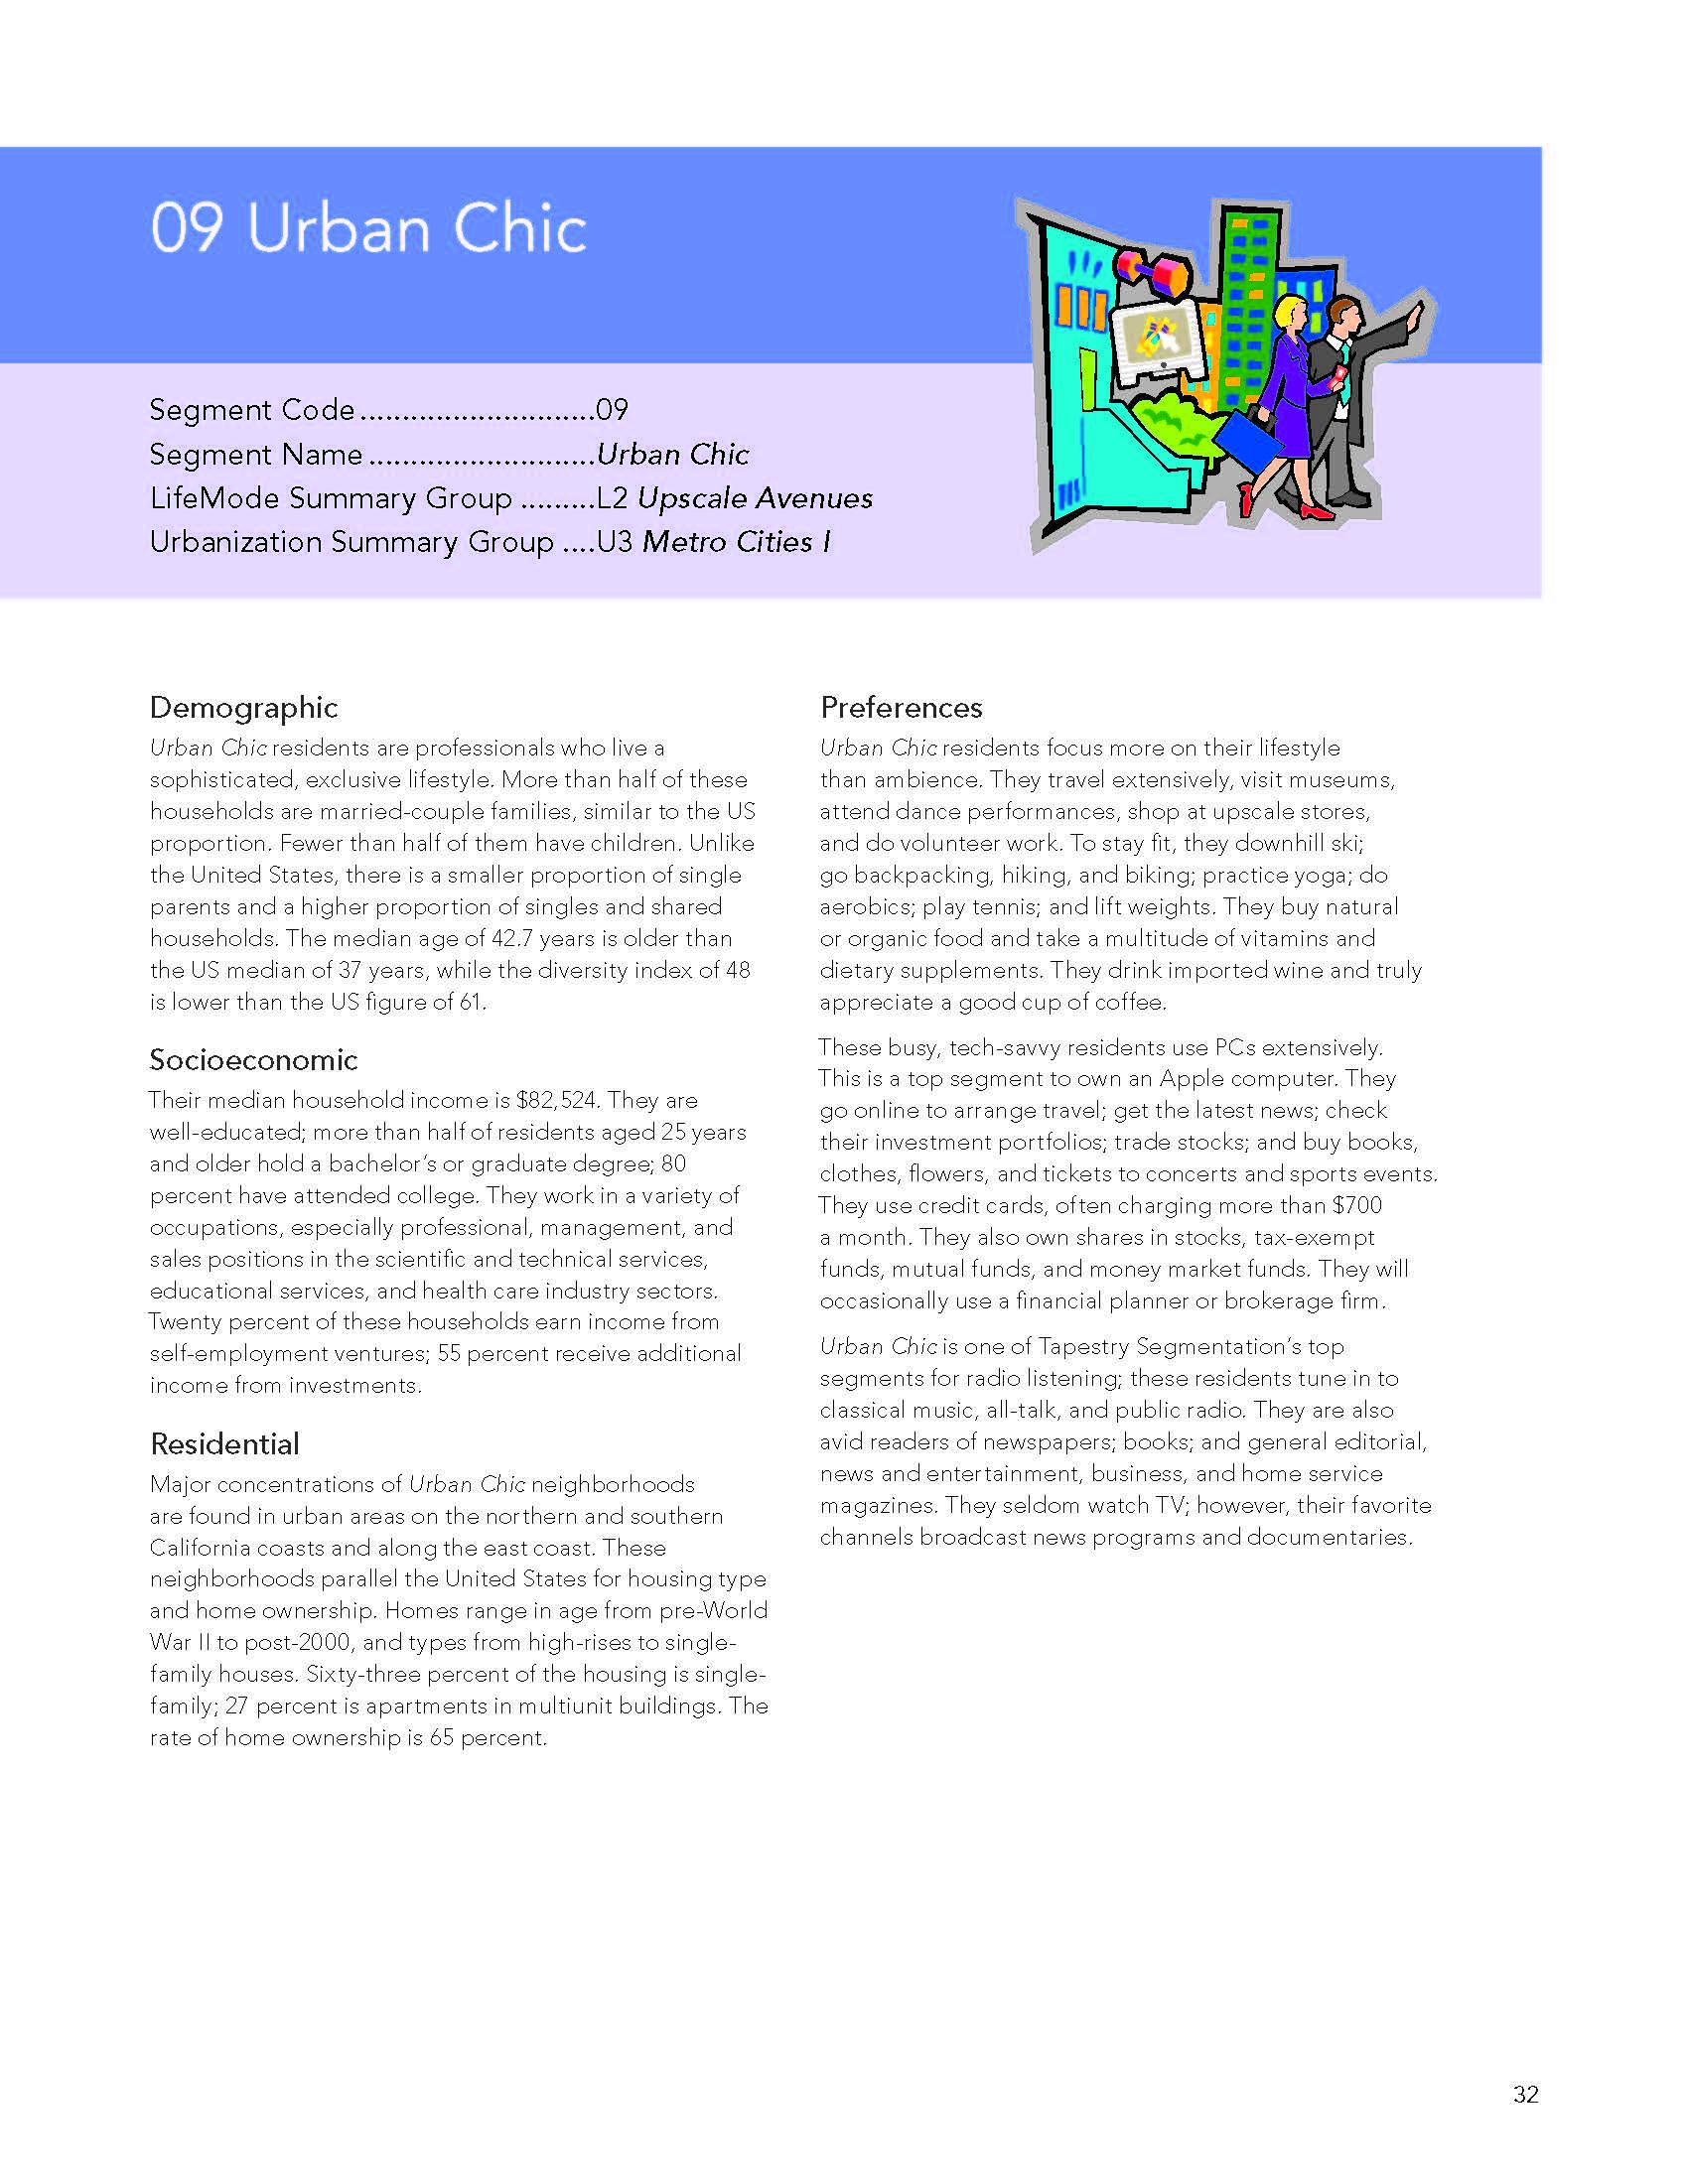 tapestry-segmentation_Page_35.jpg